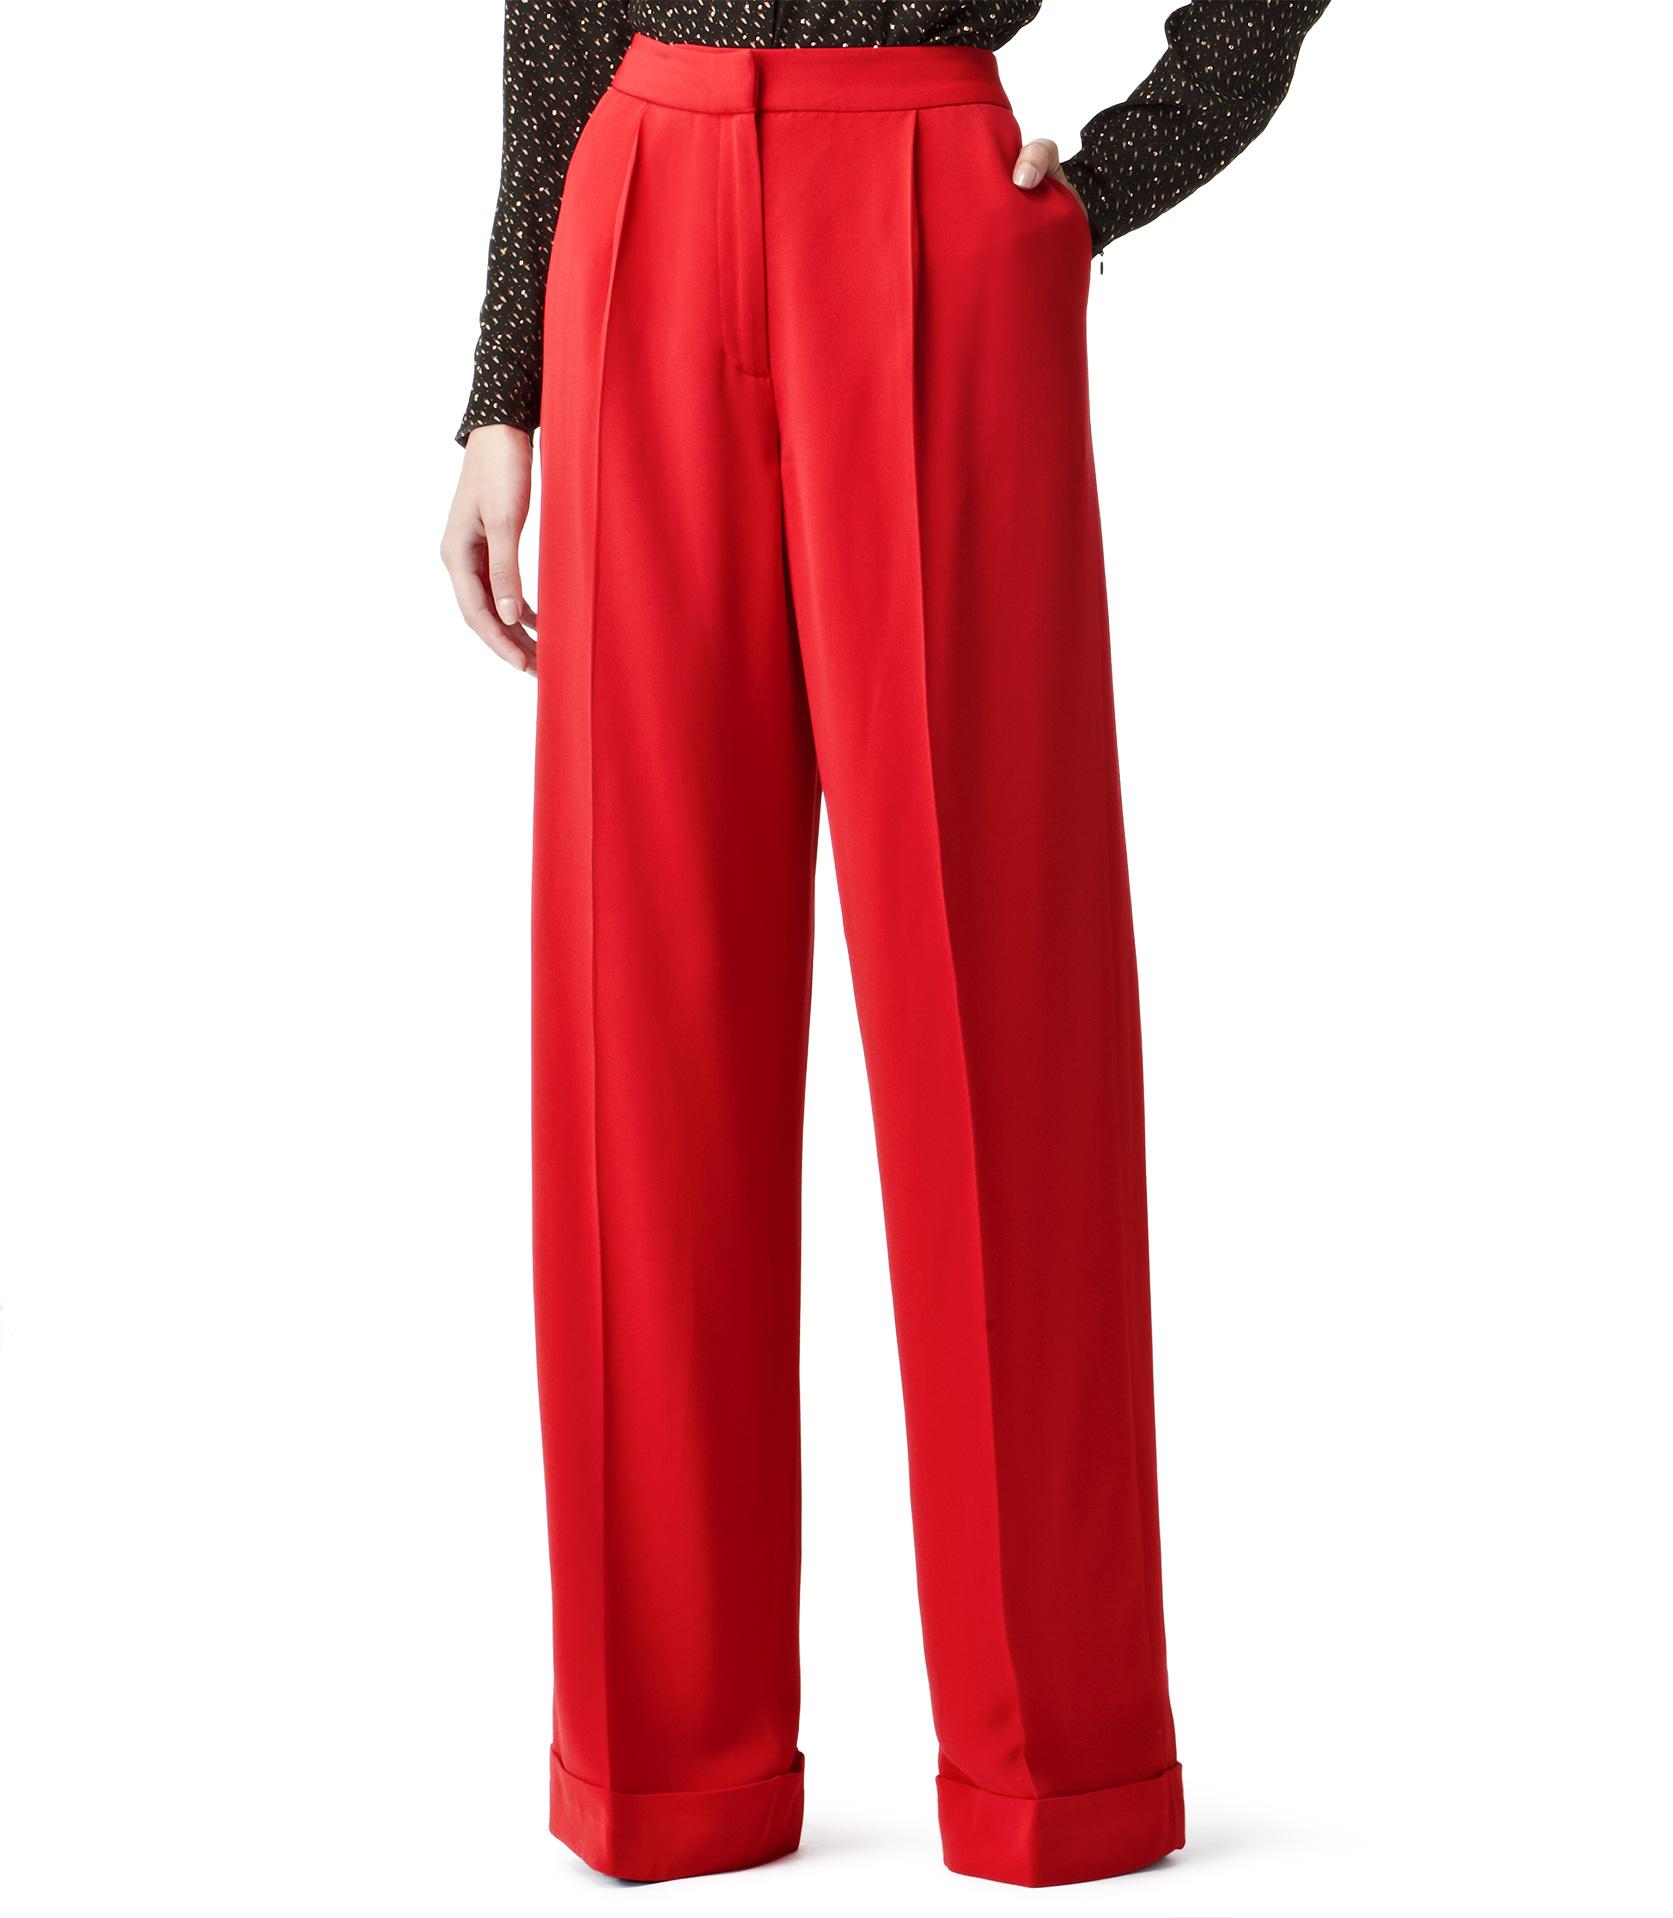 Reiss Daria Wide Leg Trousers in Red